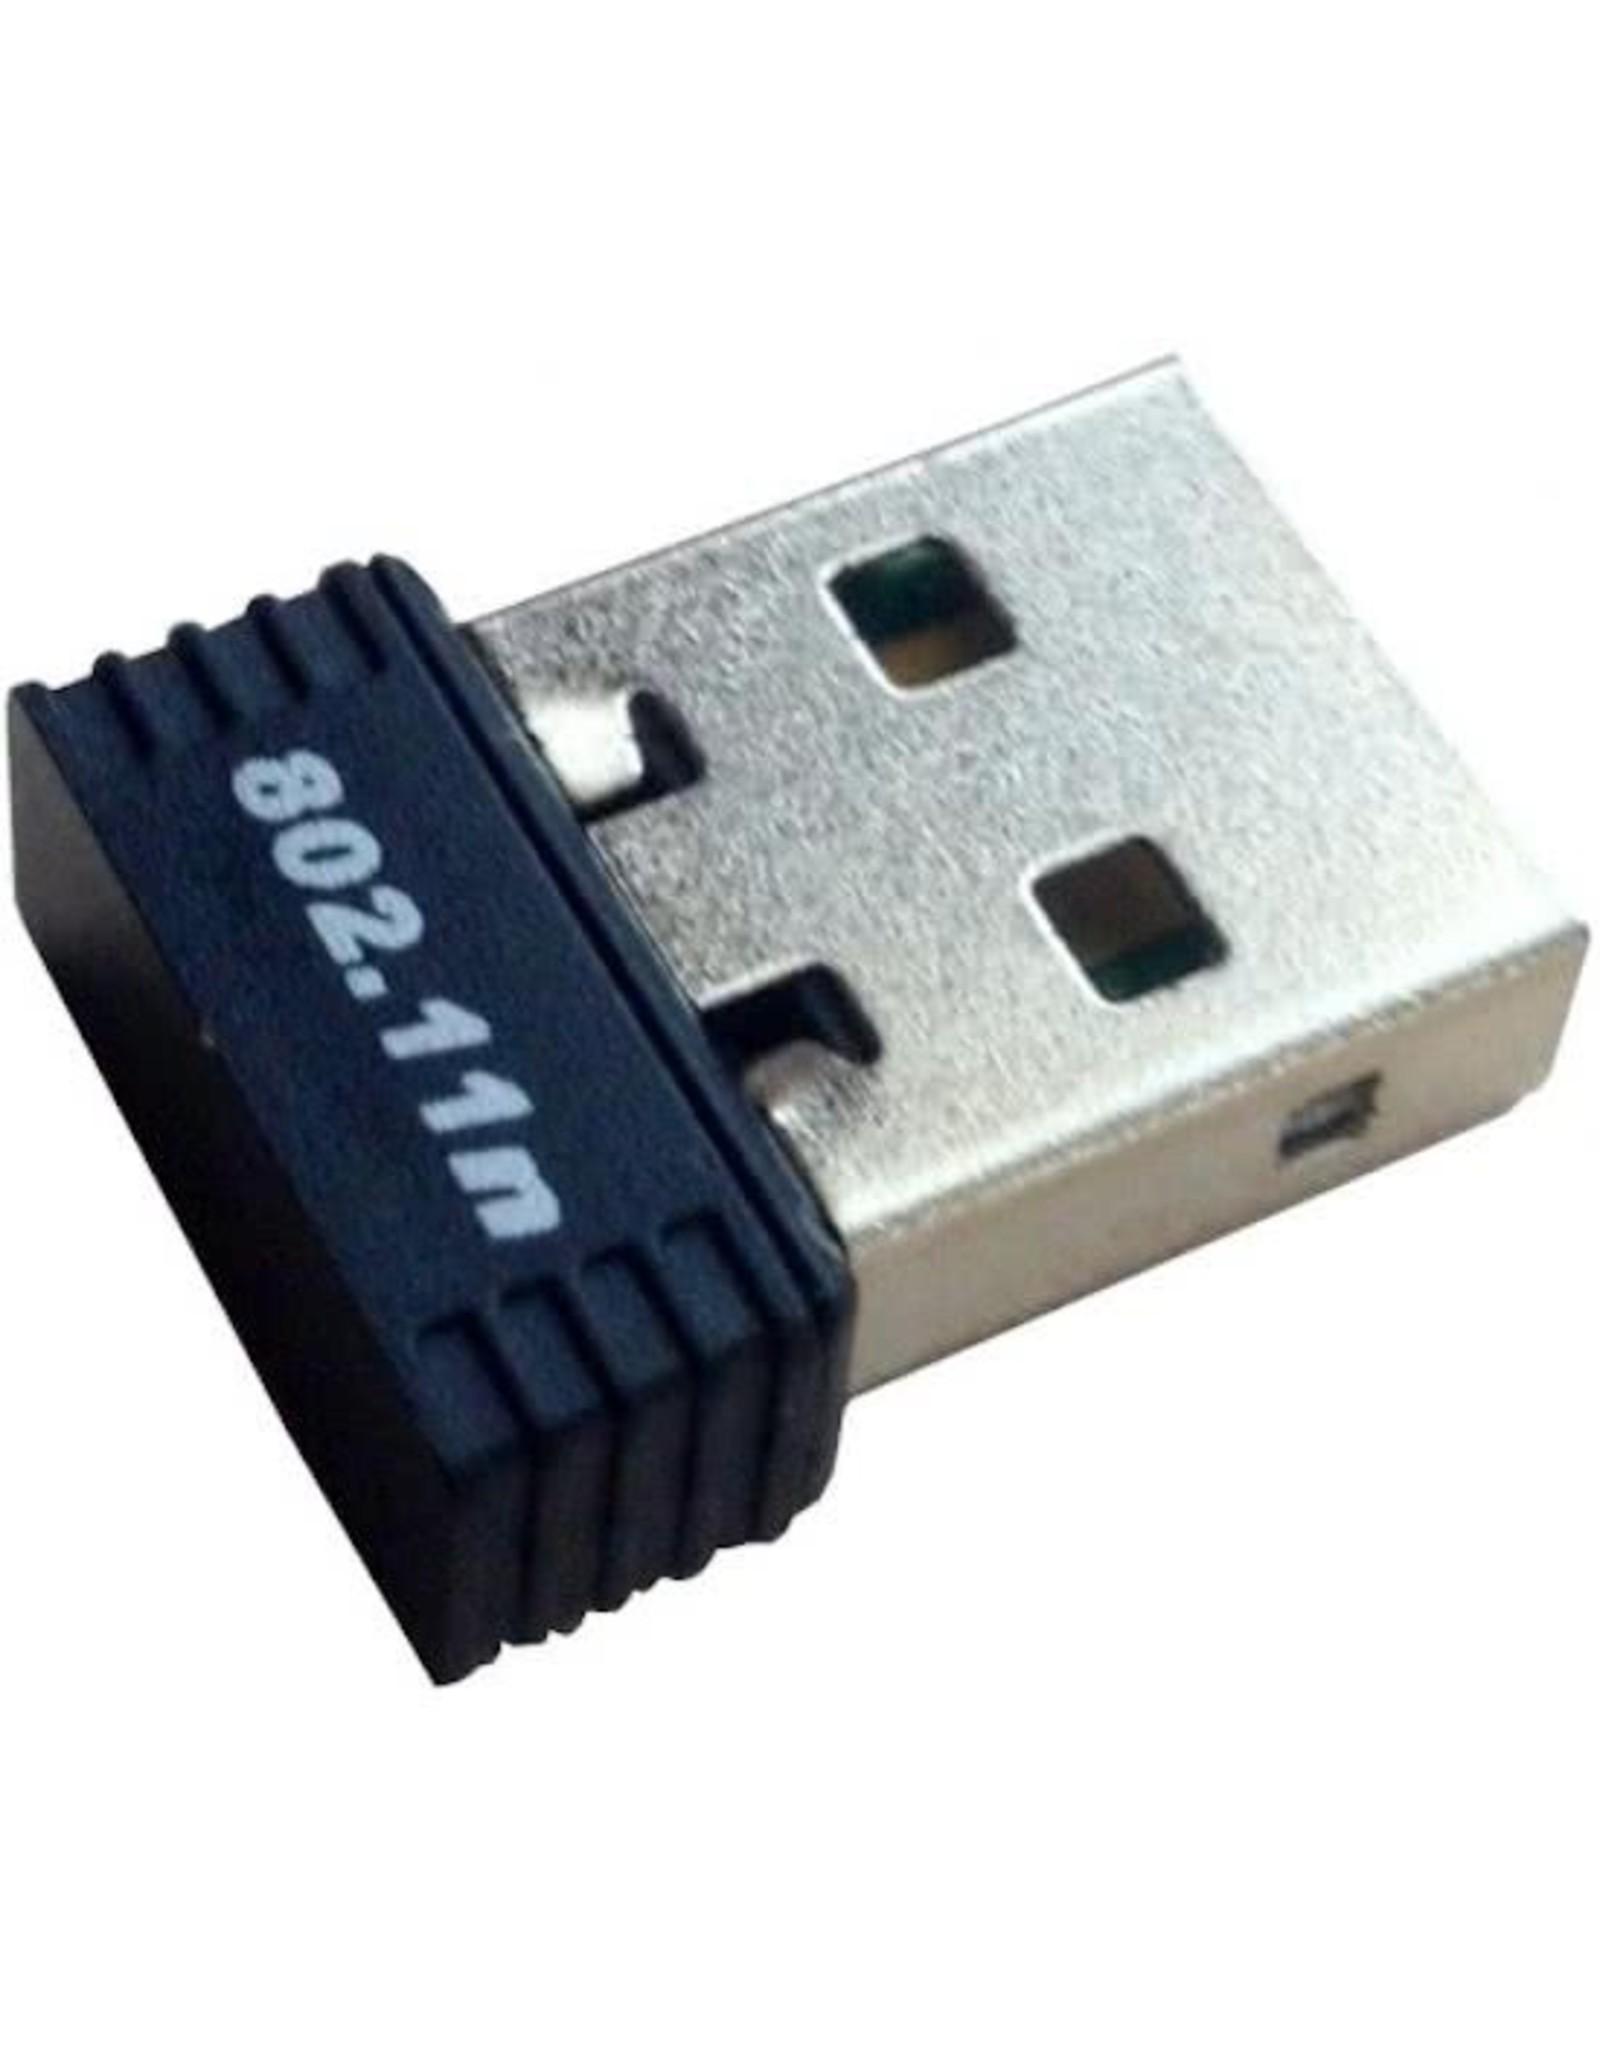 Mini USB WiFi Adapter 802.11N 150Mbps   WiFi Dongle   Mini WiFi USB Adapter